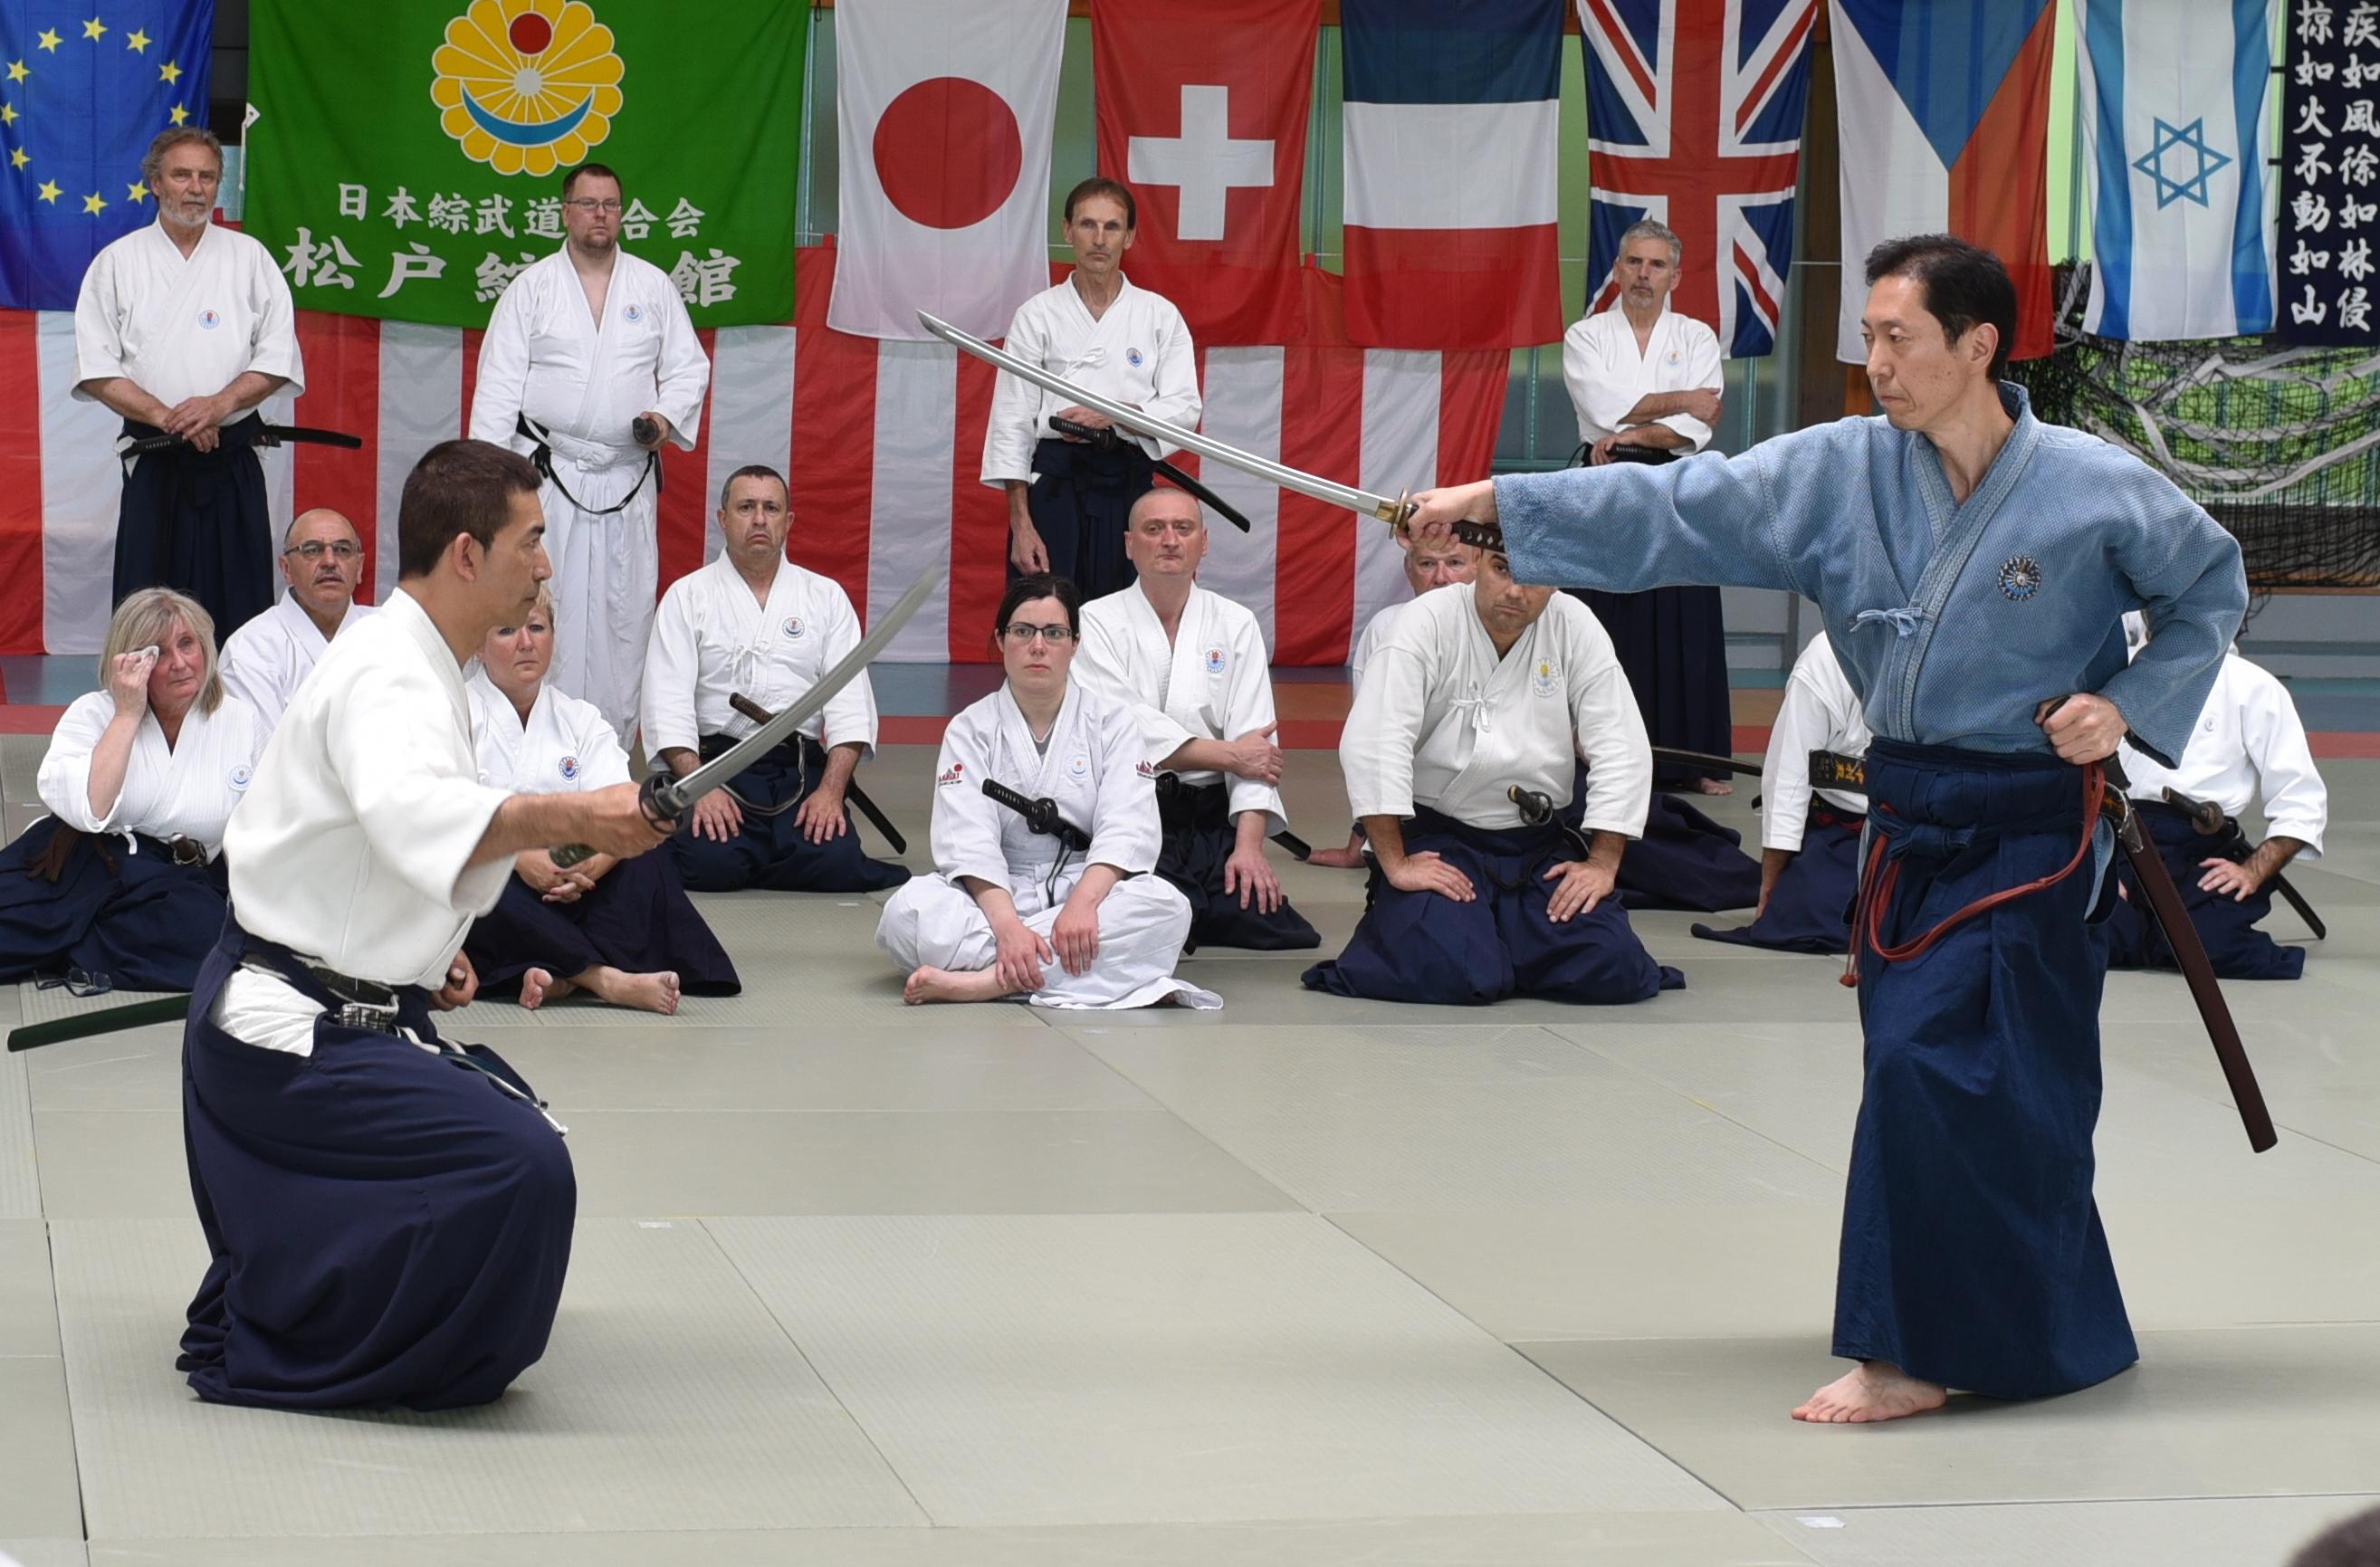 The week long training trip in Europe by Takedaryu-Nakamura ha